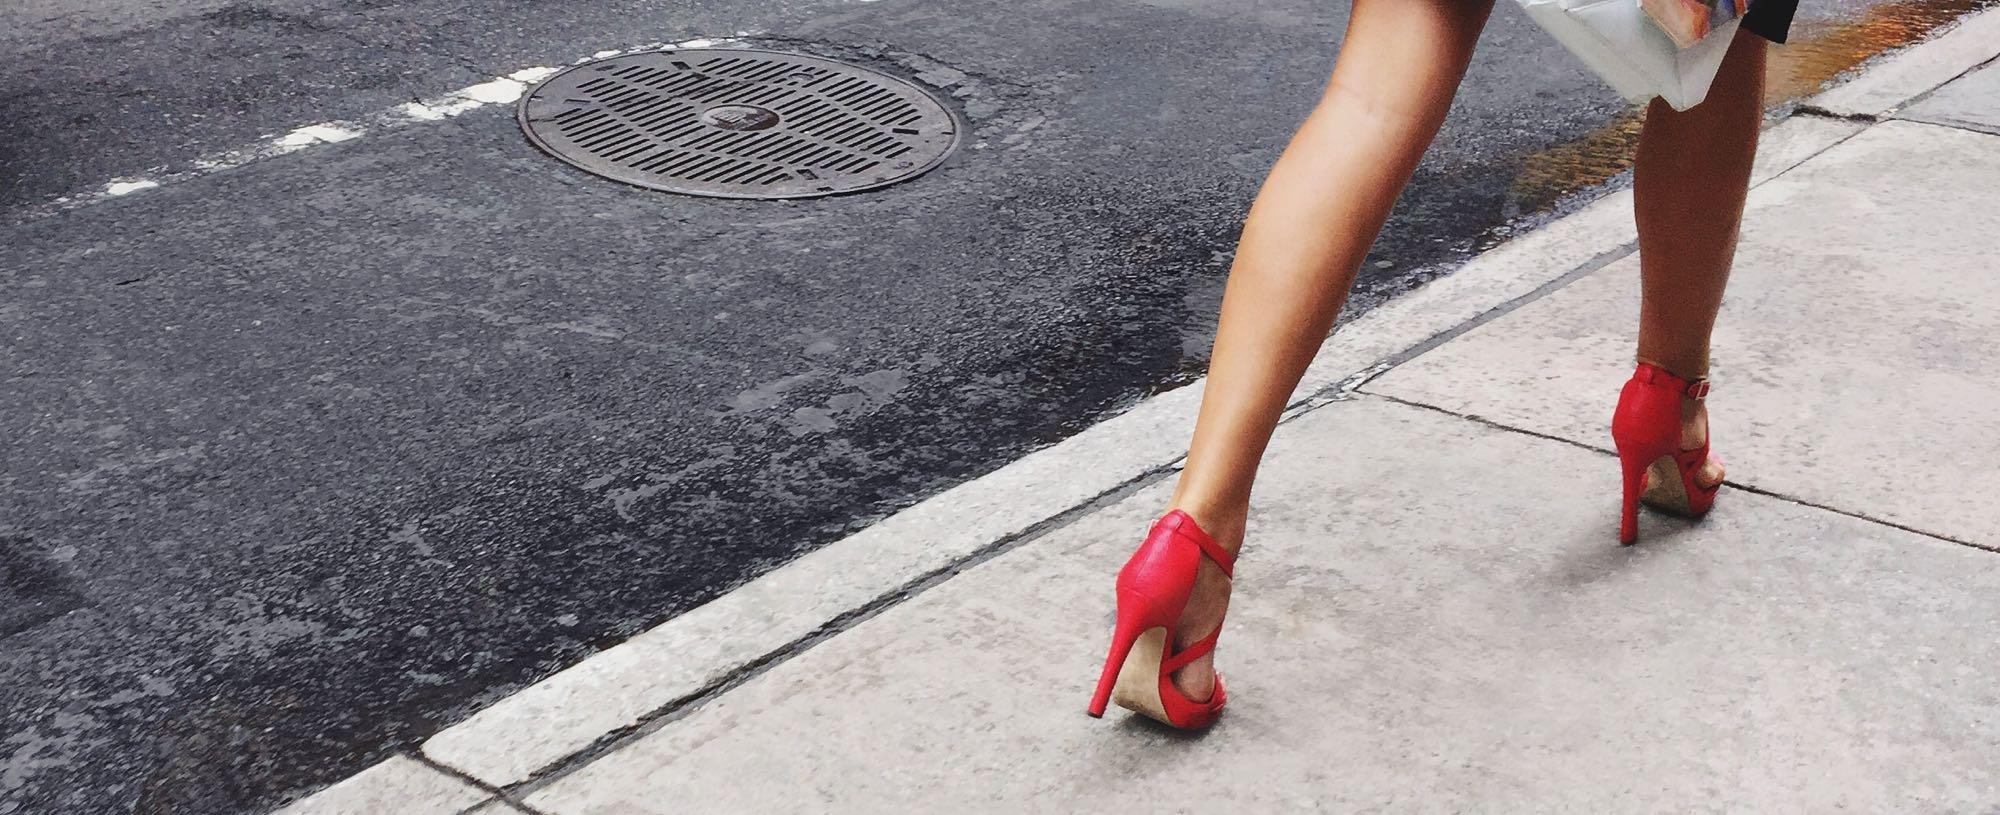 High Heels on Sidewalk 2